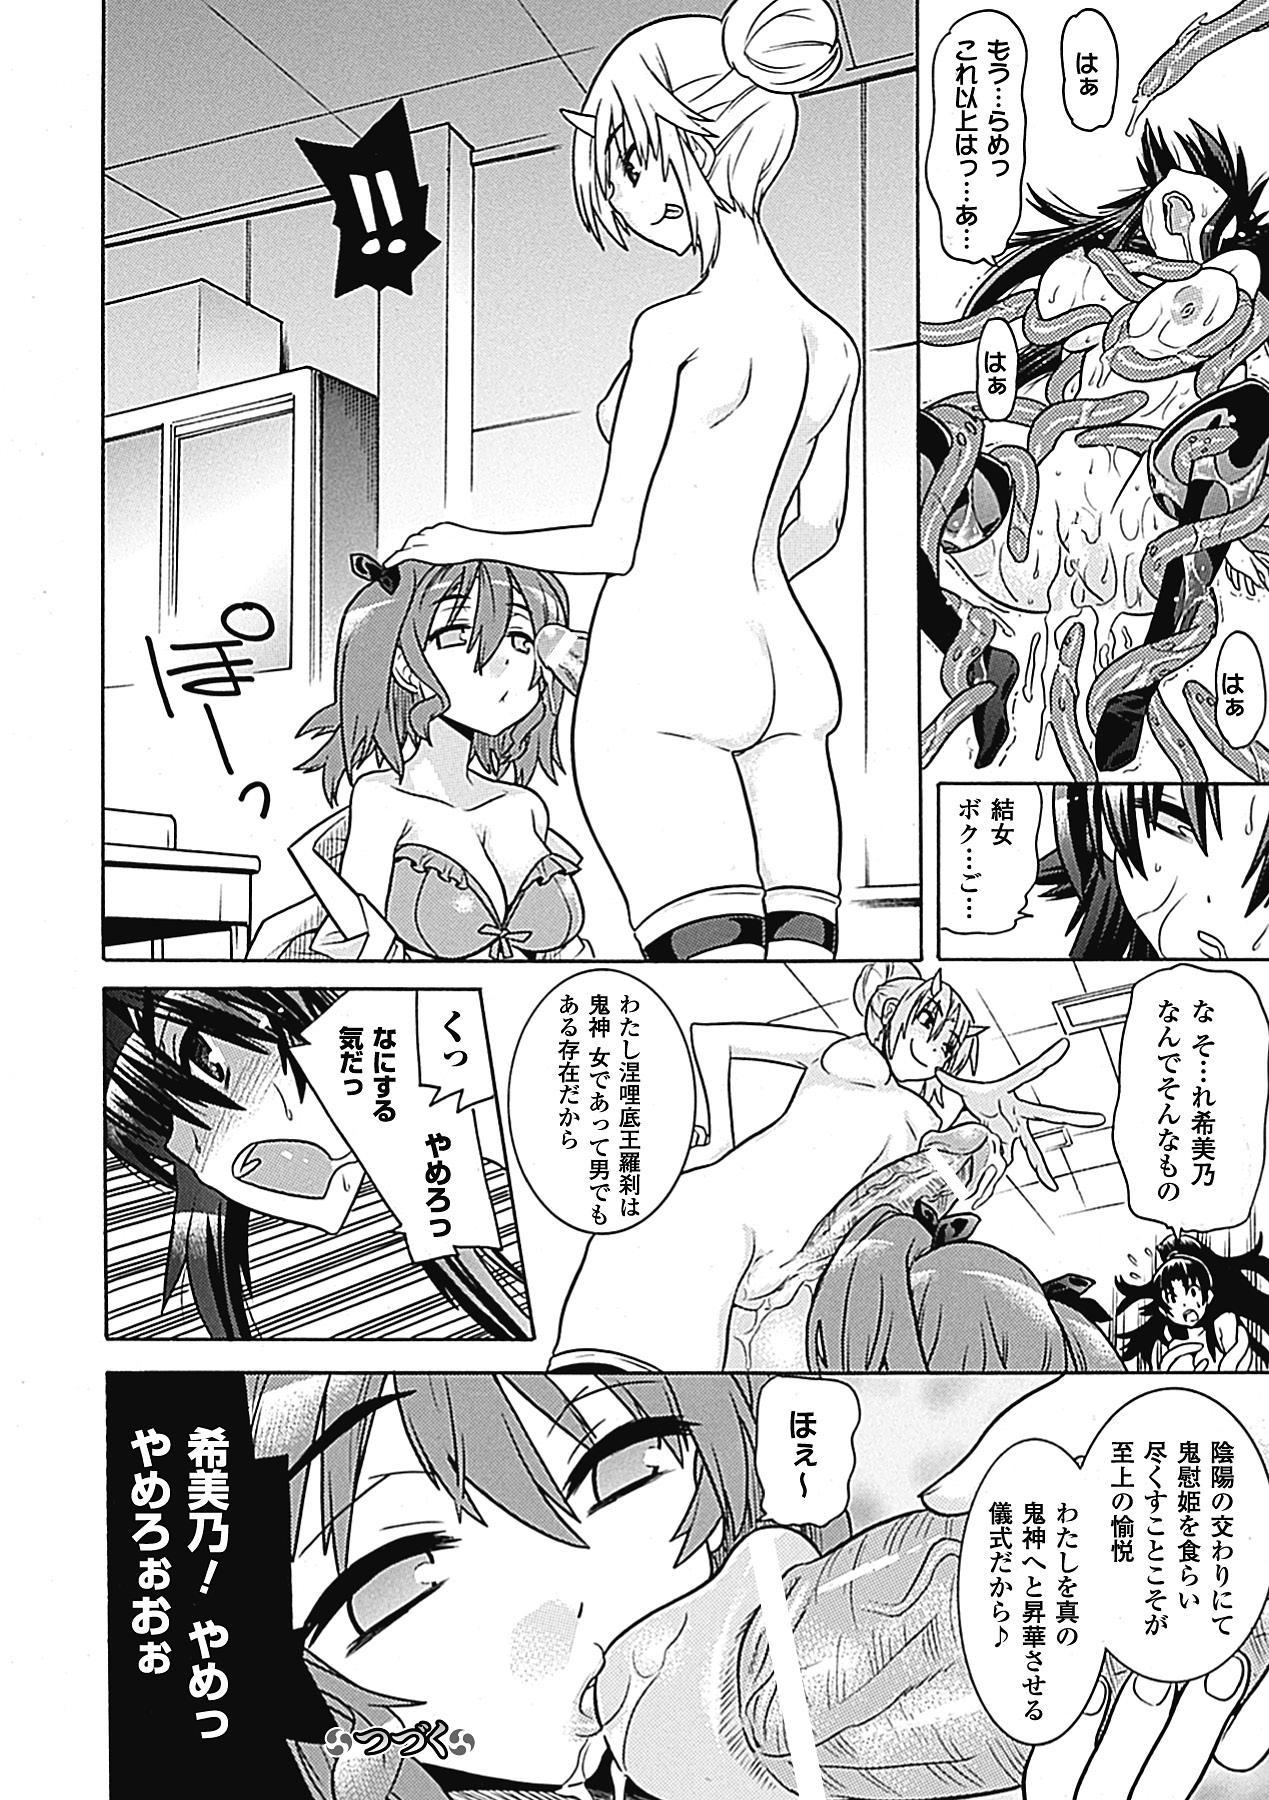 Megami Crisis 5 81